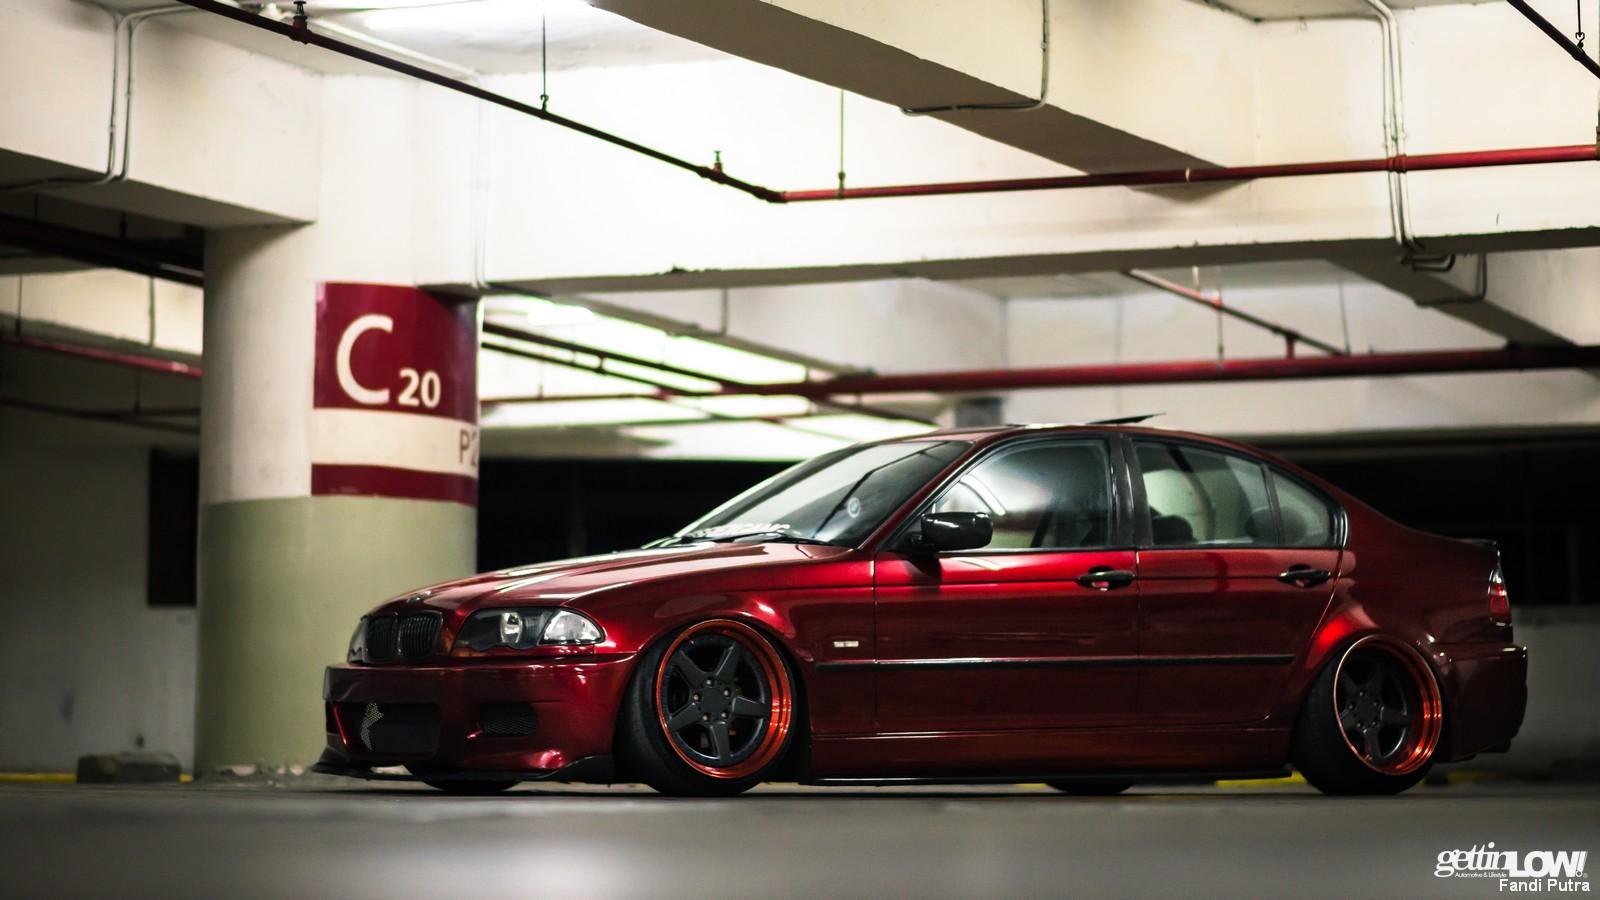 BMW-Maroon-gesrex_08